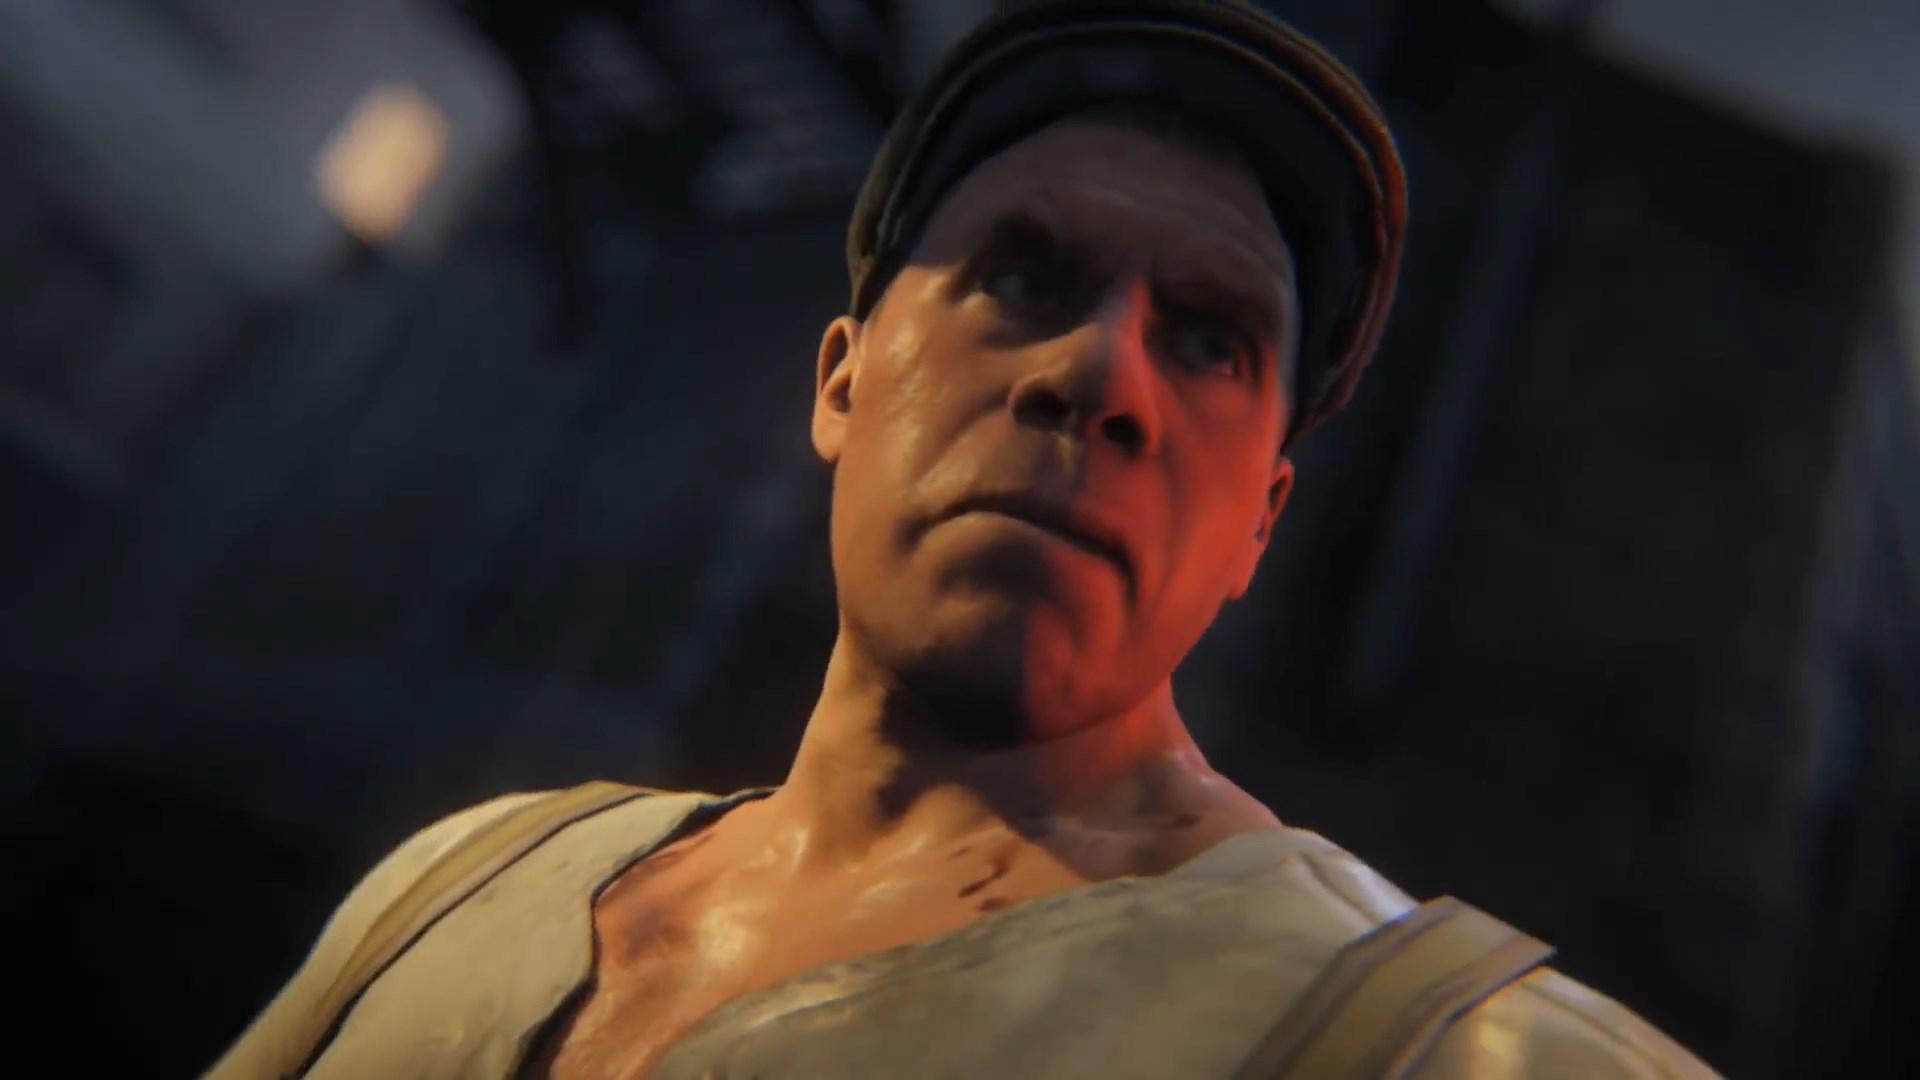 Floyd Campbell | Call of Duty Wiki | FANDOM powered by Wikia